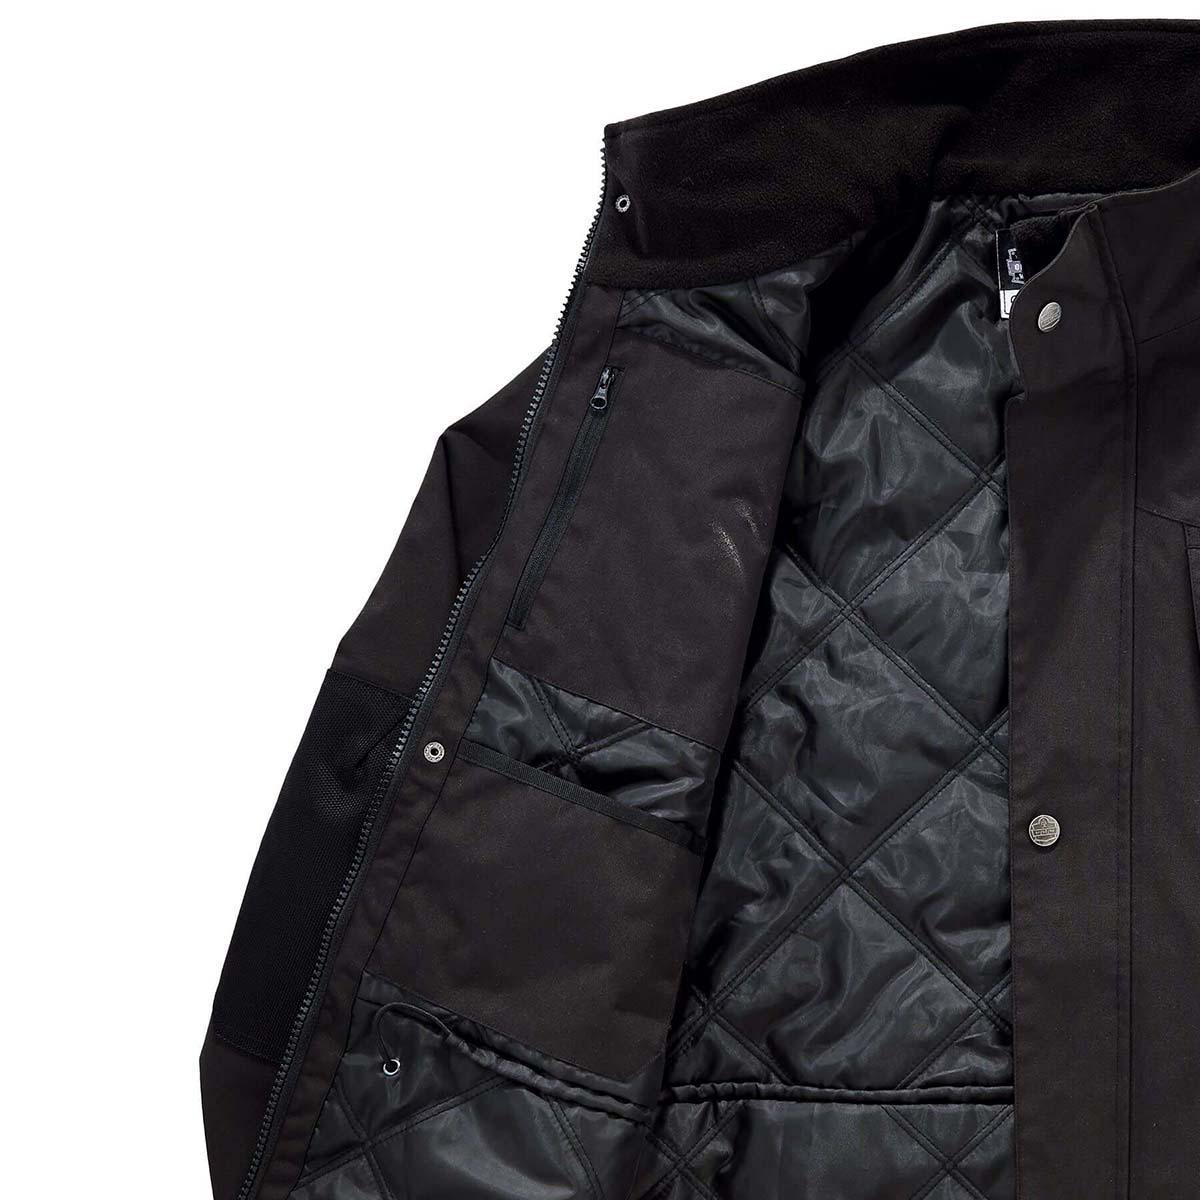 6466 XL Black Thermal Jacket